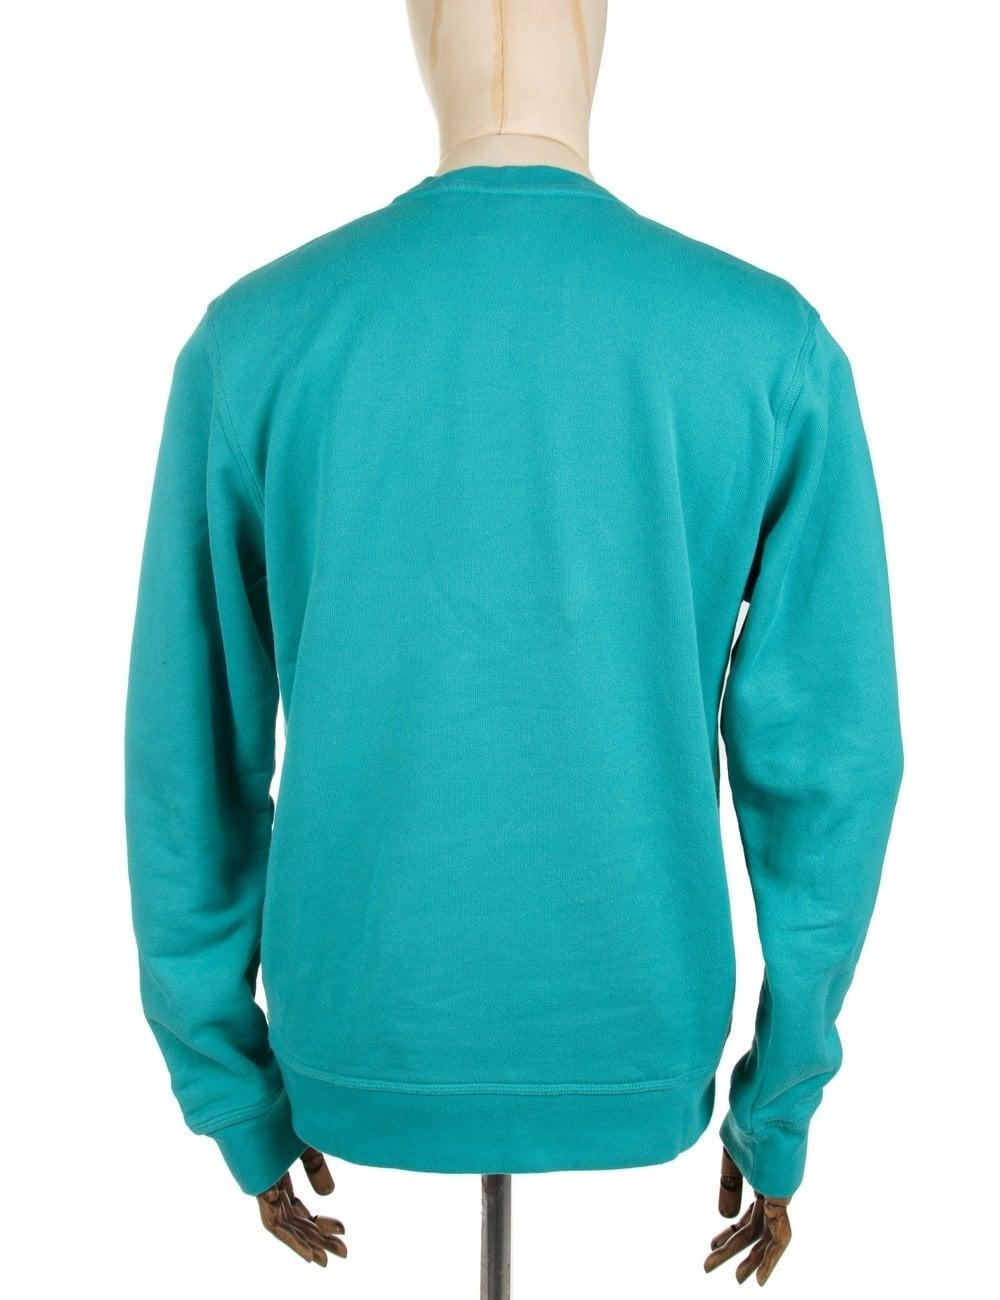 Nike AW77 Bolts Crewneck Sweatshirt